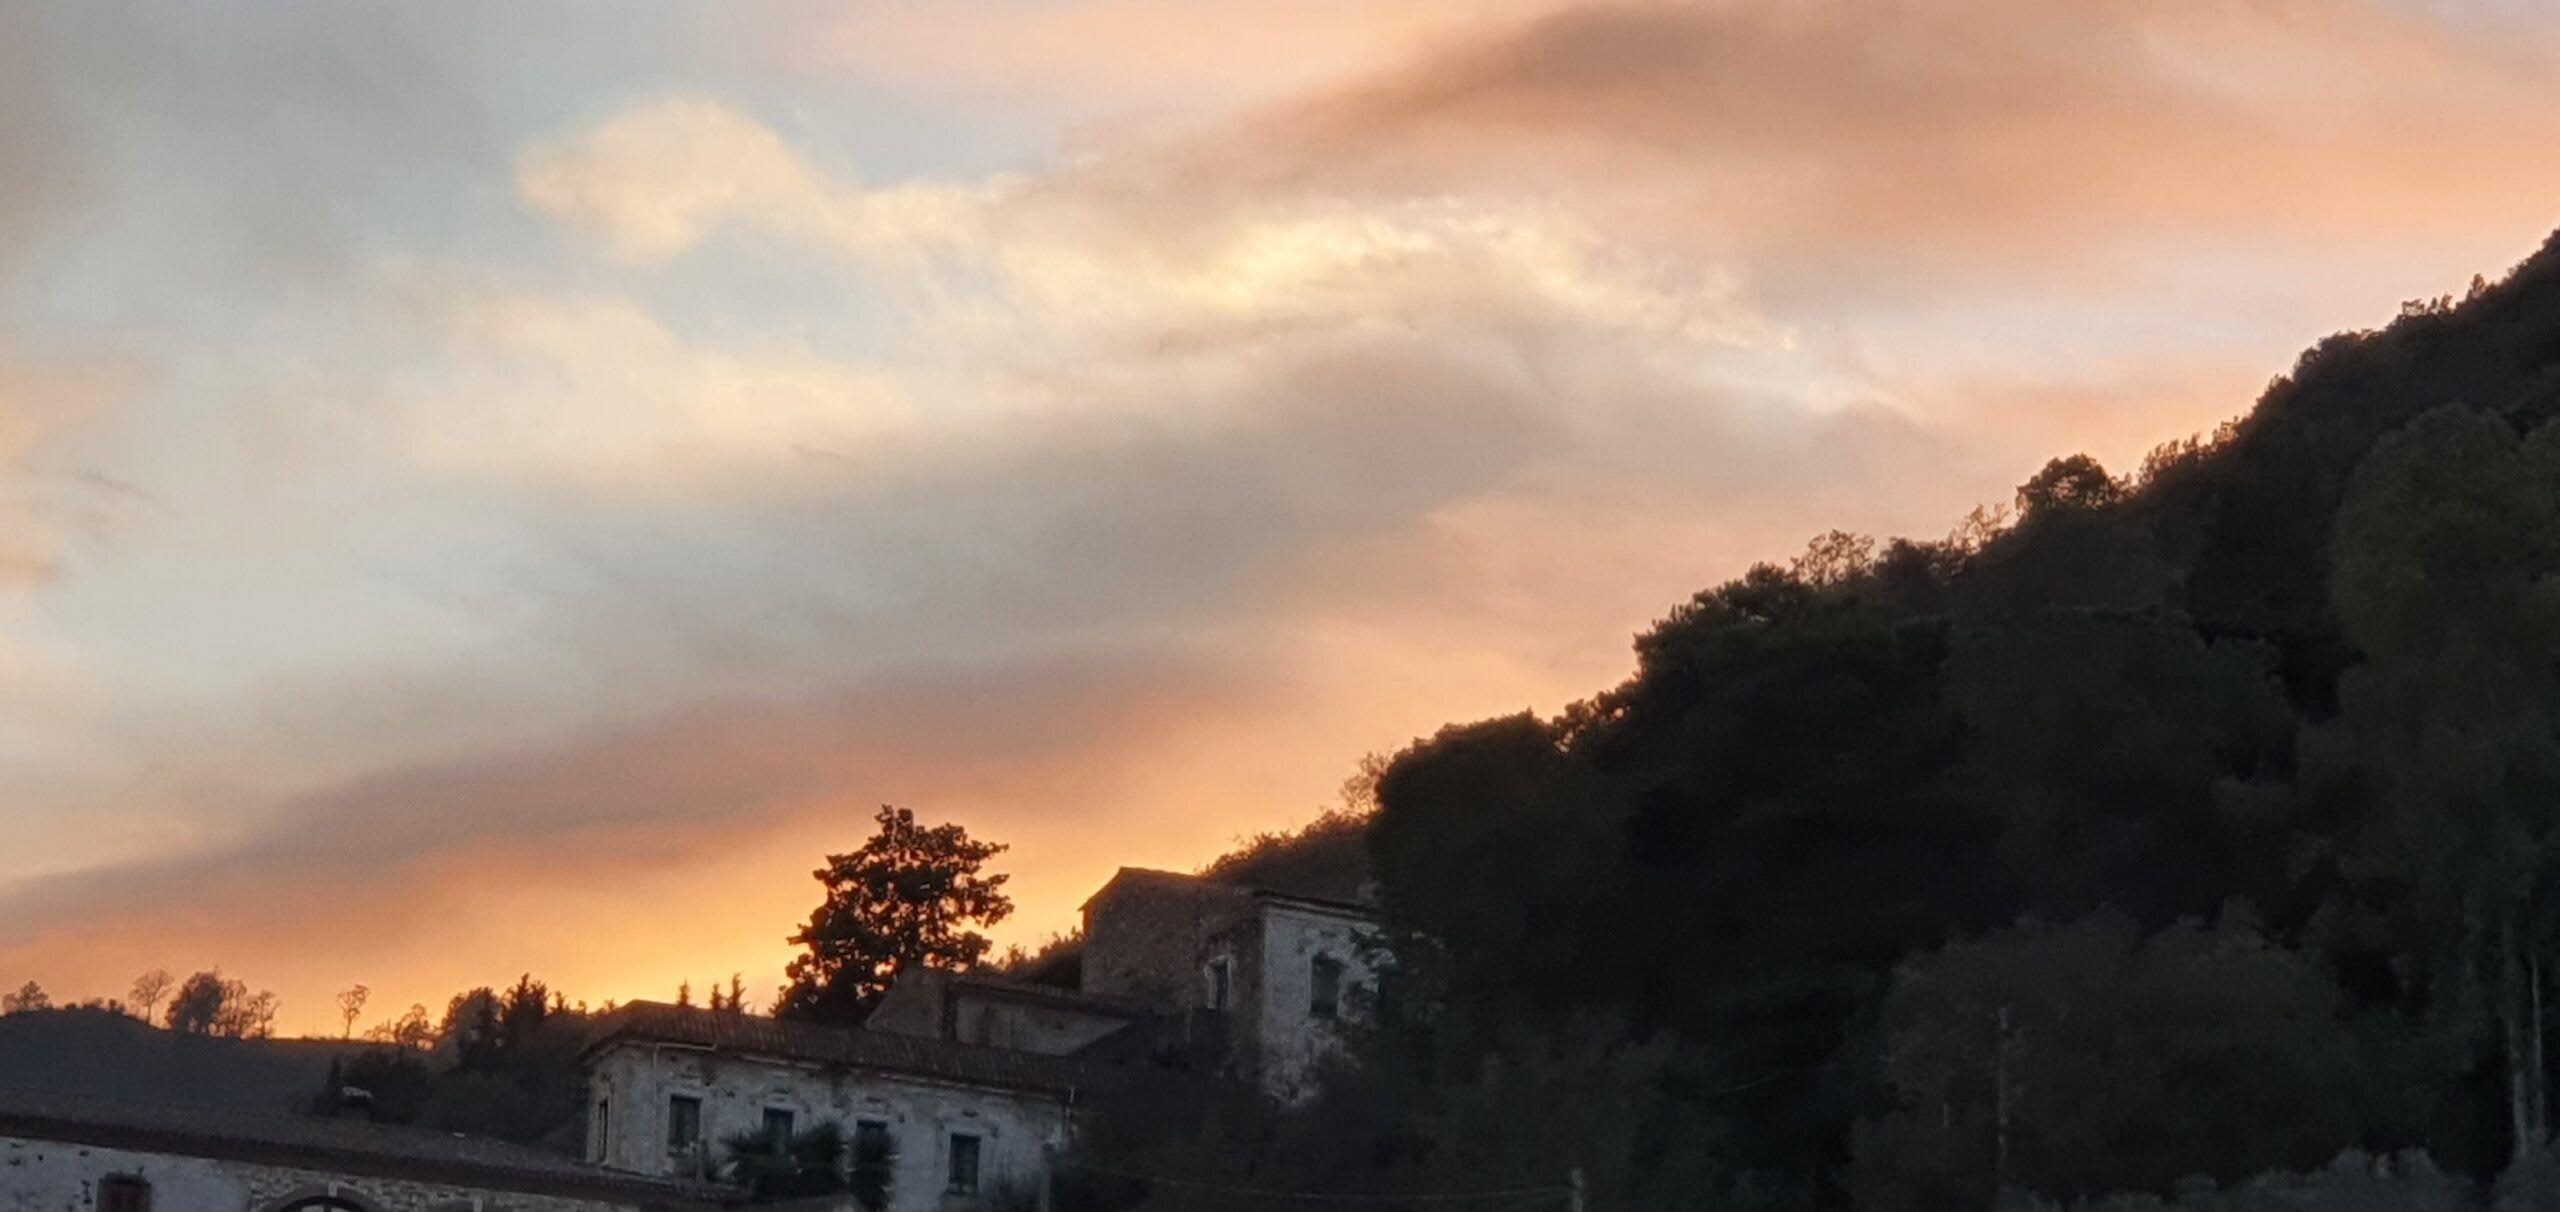 Eugenio fra le nuvole